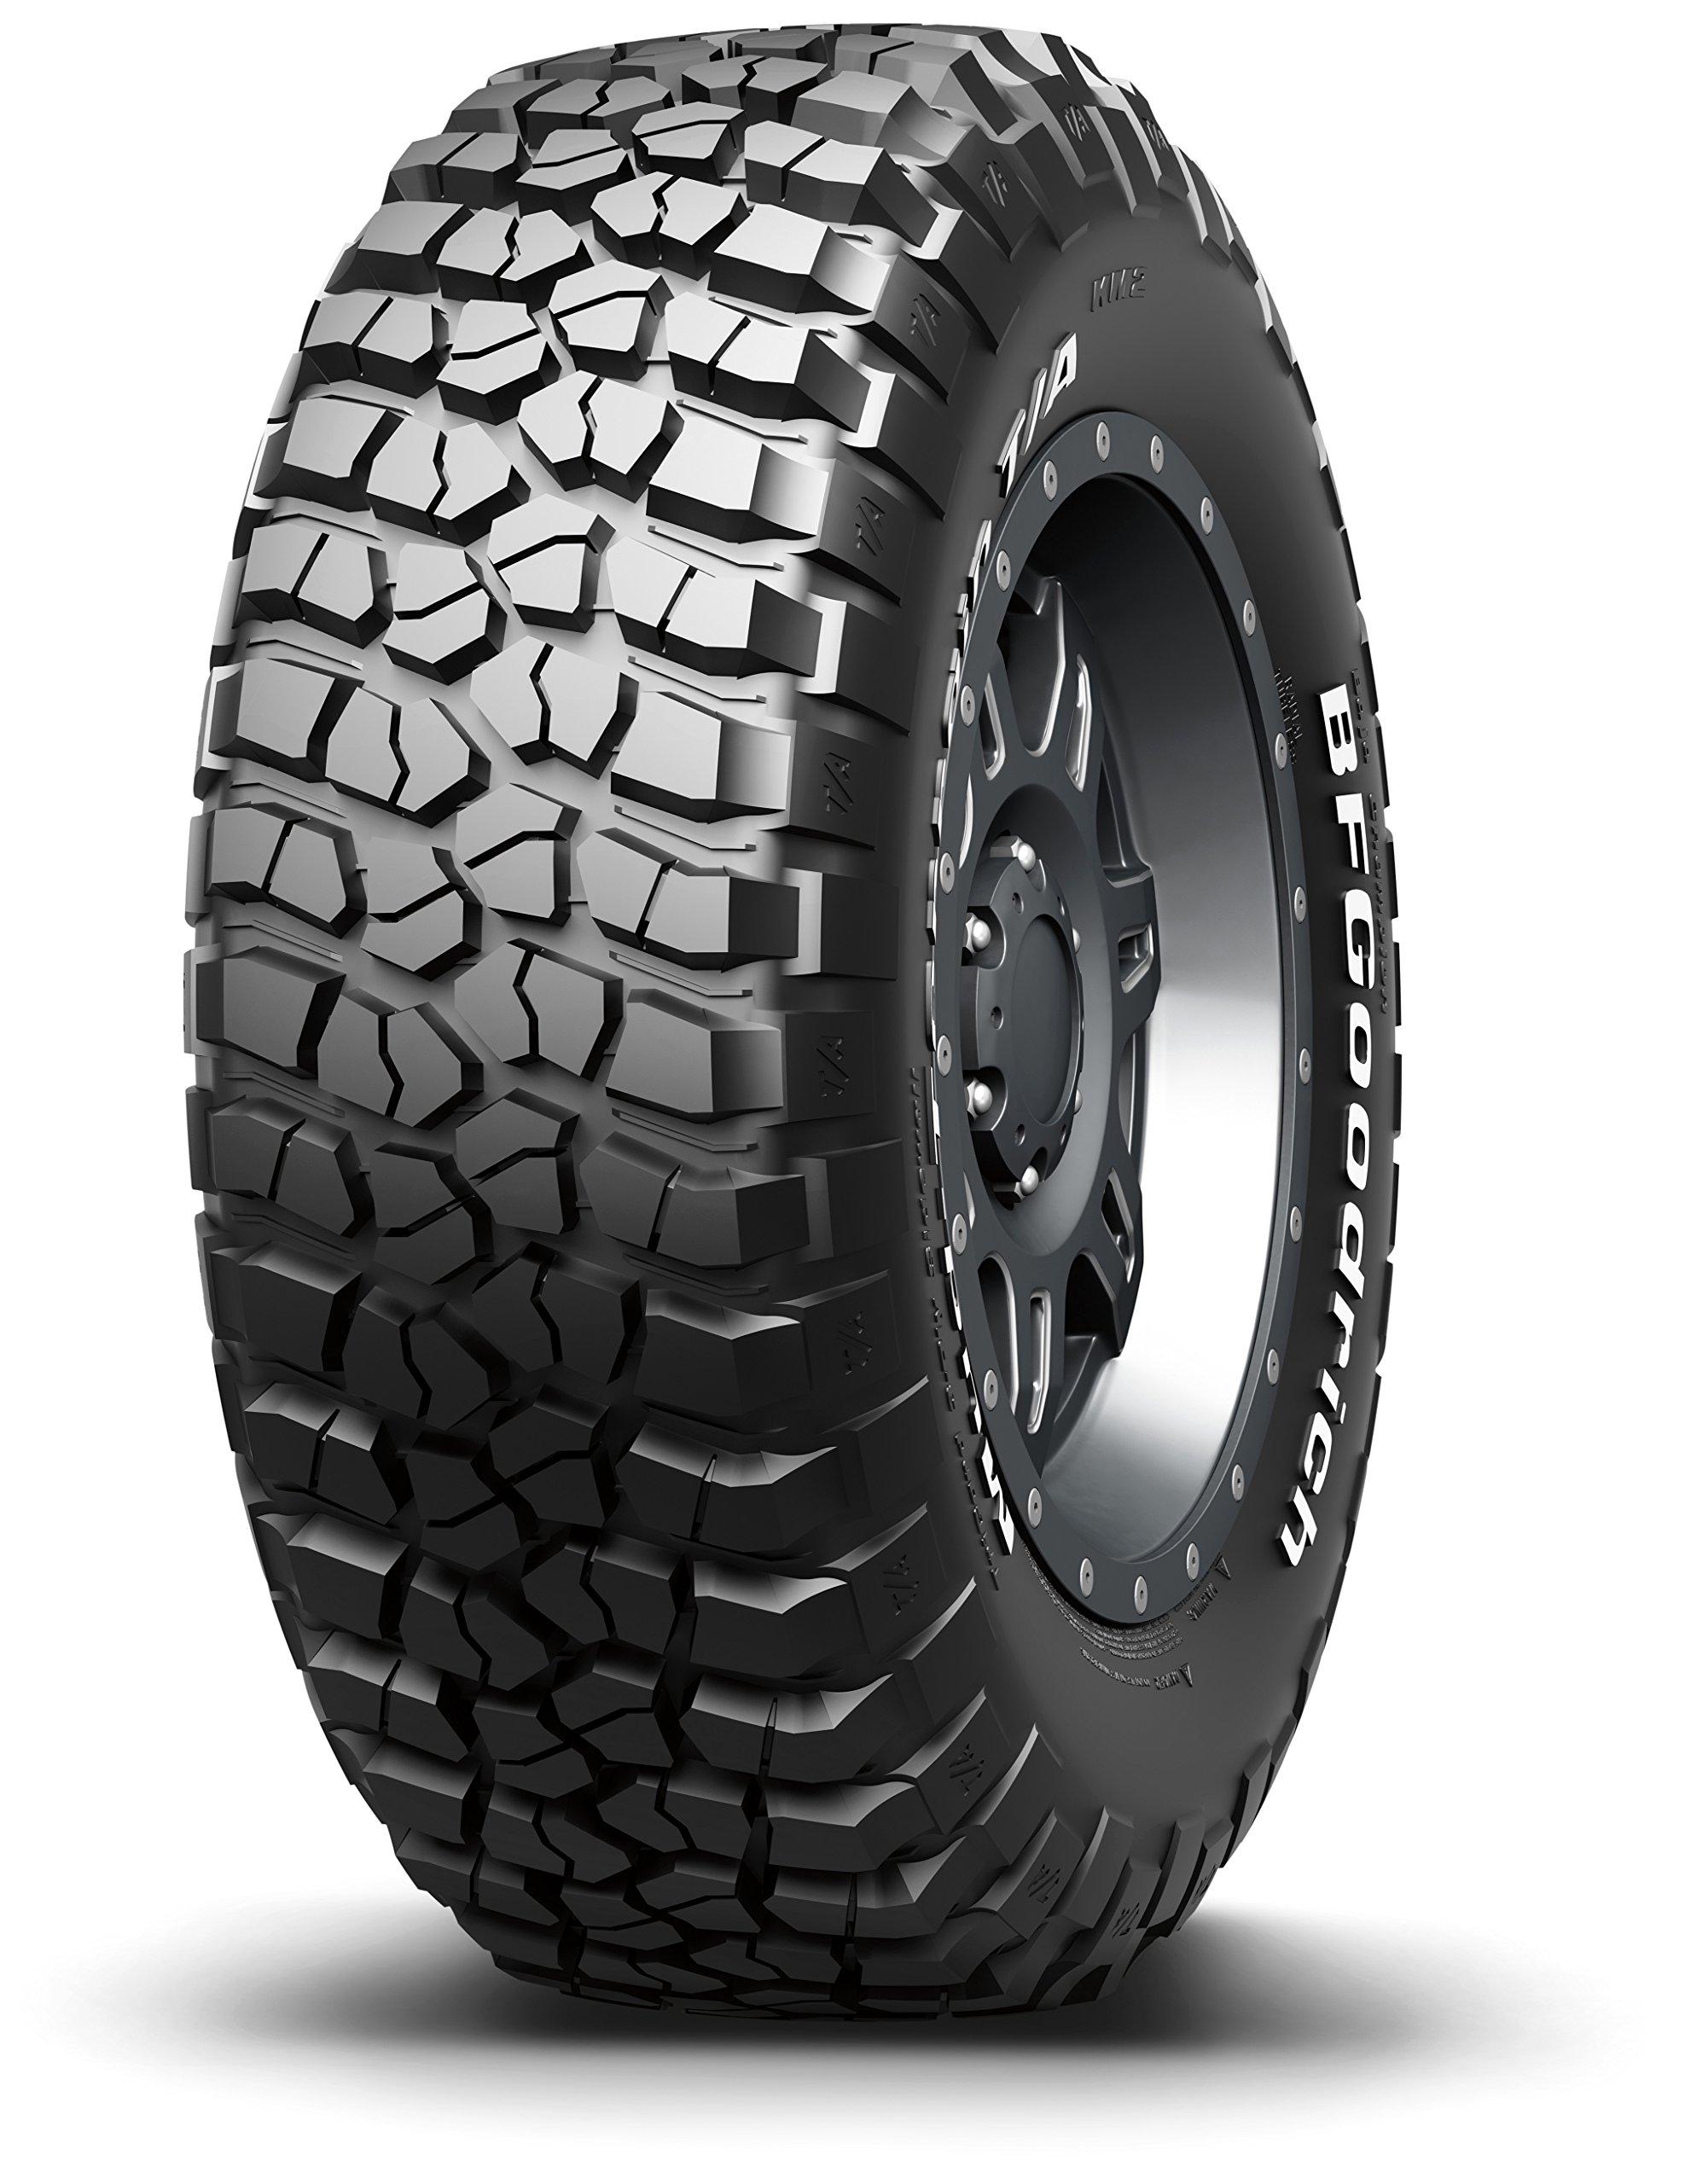 BFGoodrich Mud-Terrain T/A KM2 All-Terrain Radial Tire - 35x12.50R17/D 119Q